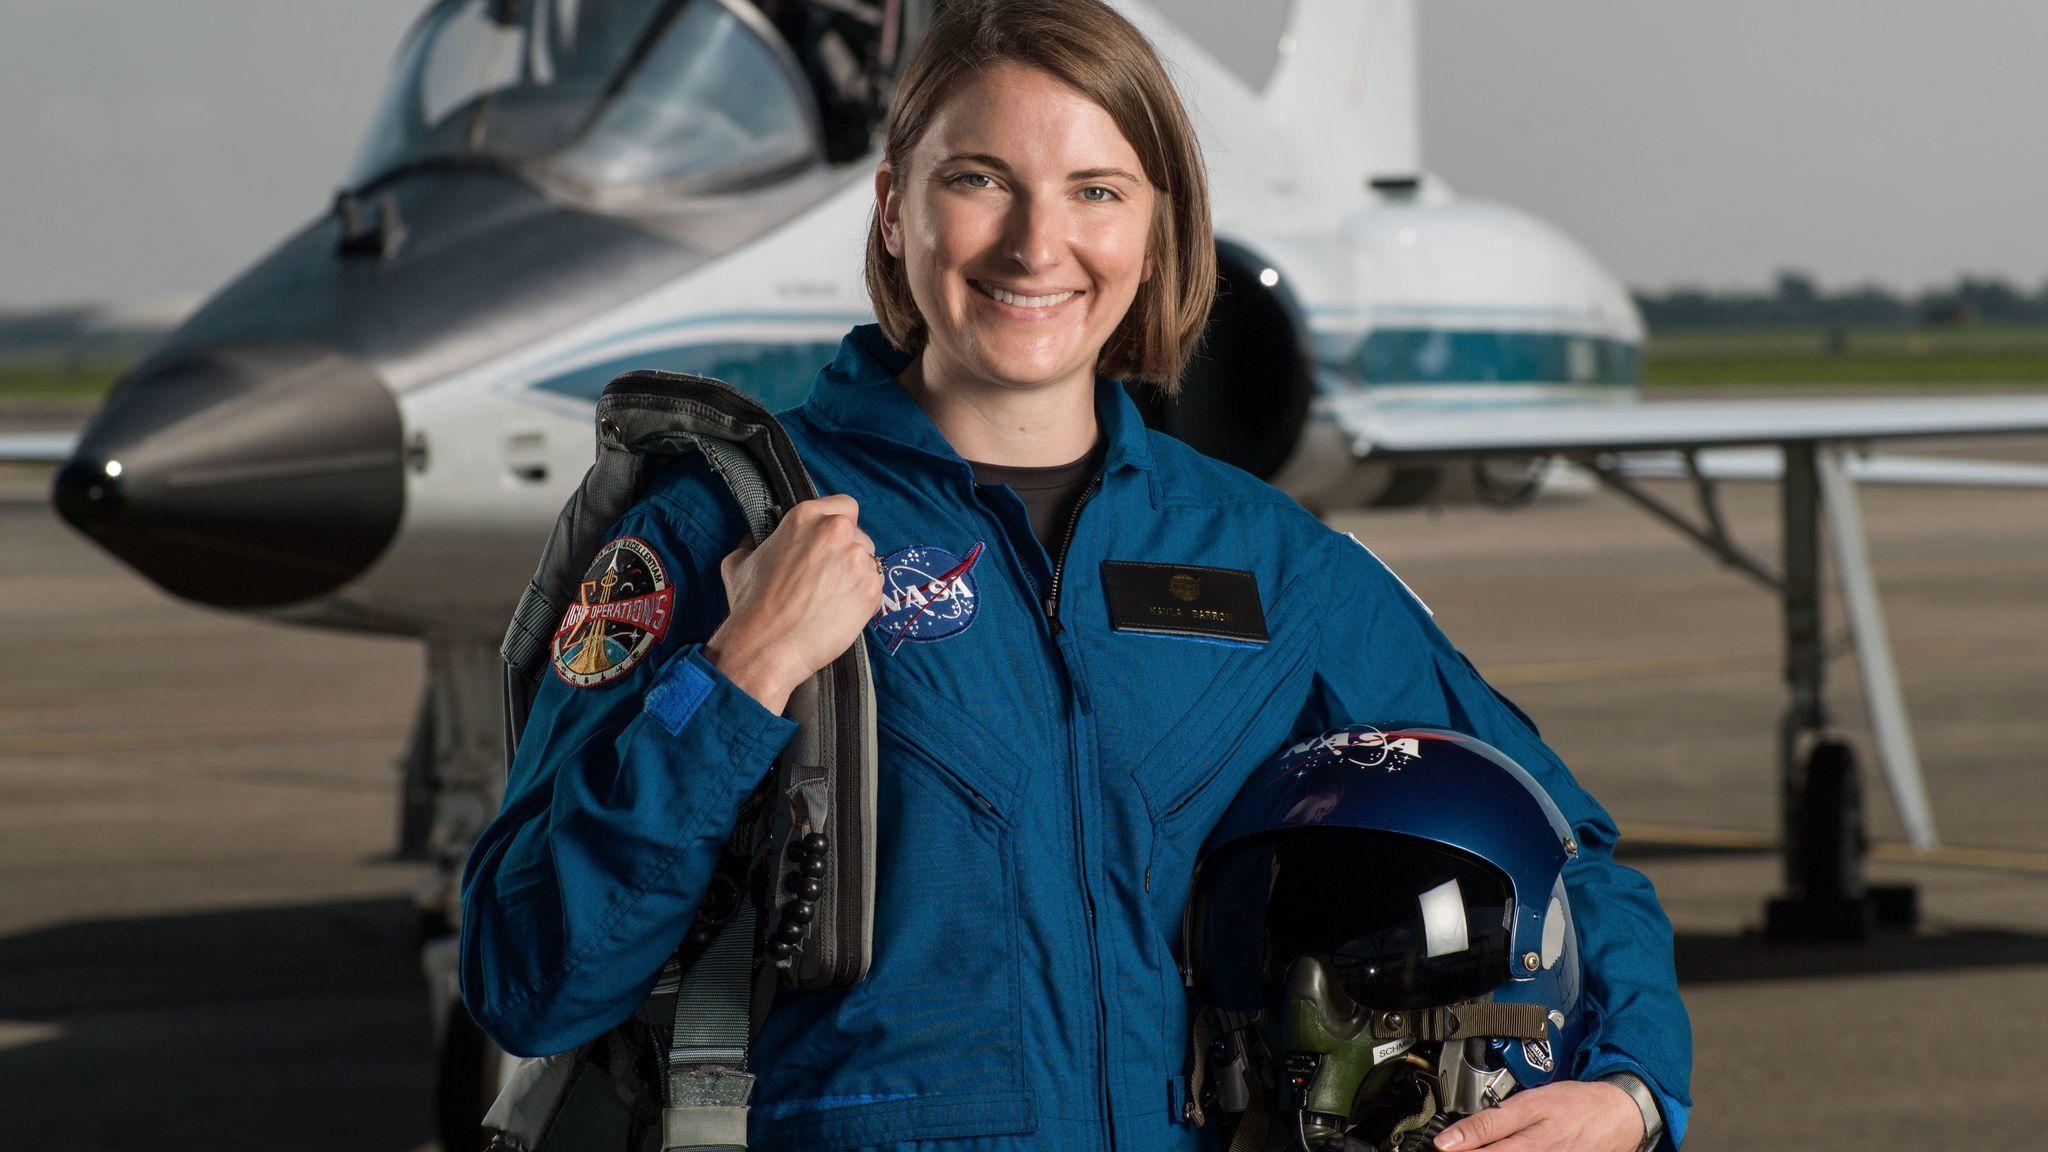 Astronaut Candidate Kayla Barron